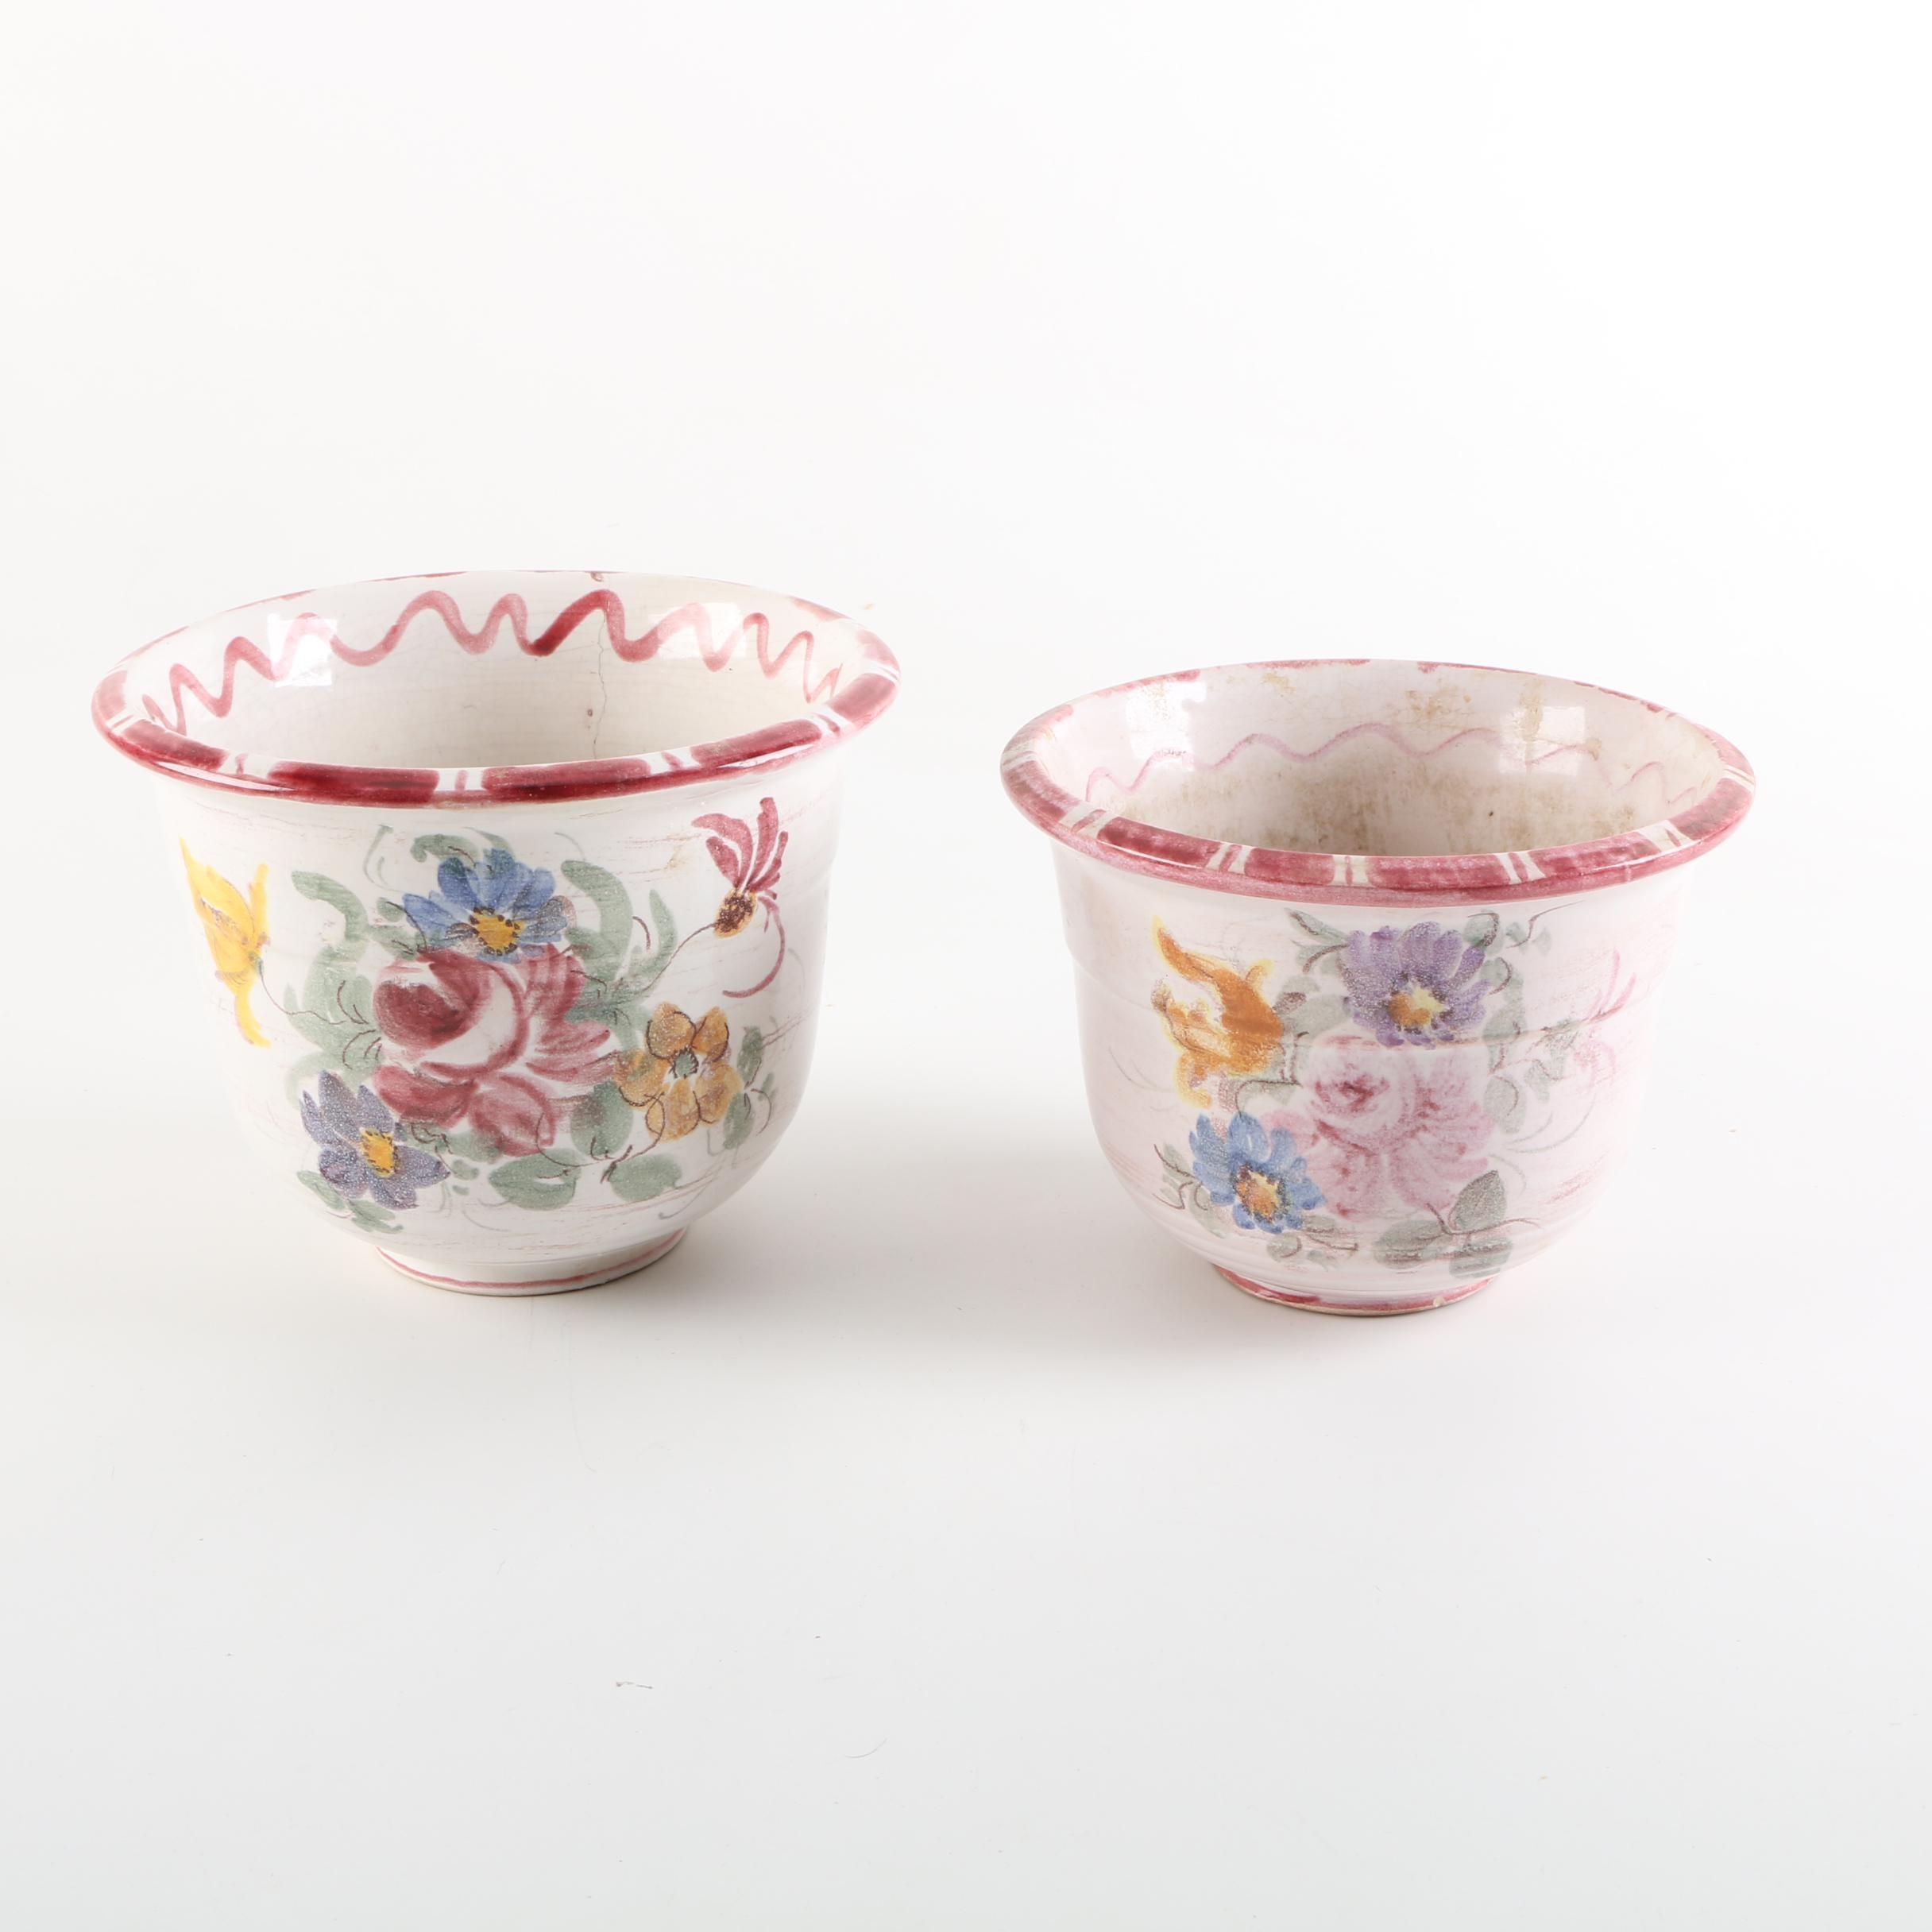 German Floral Ceramic Planters